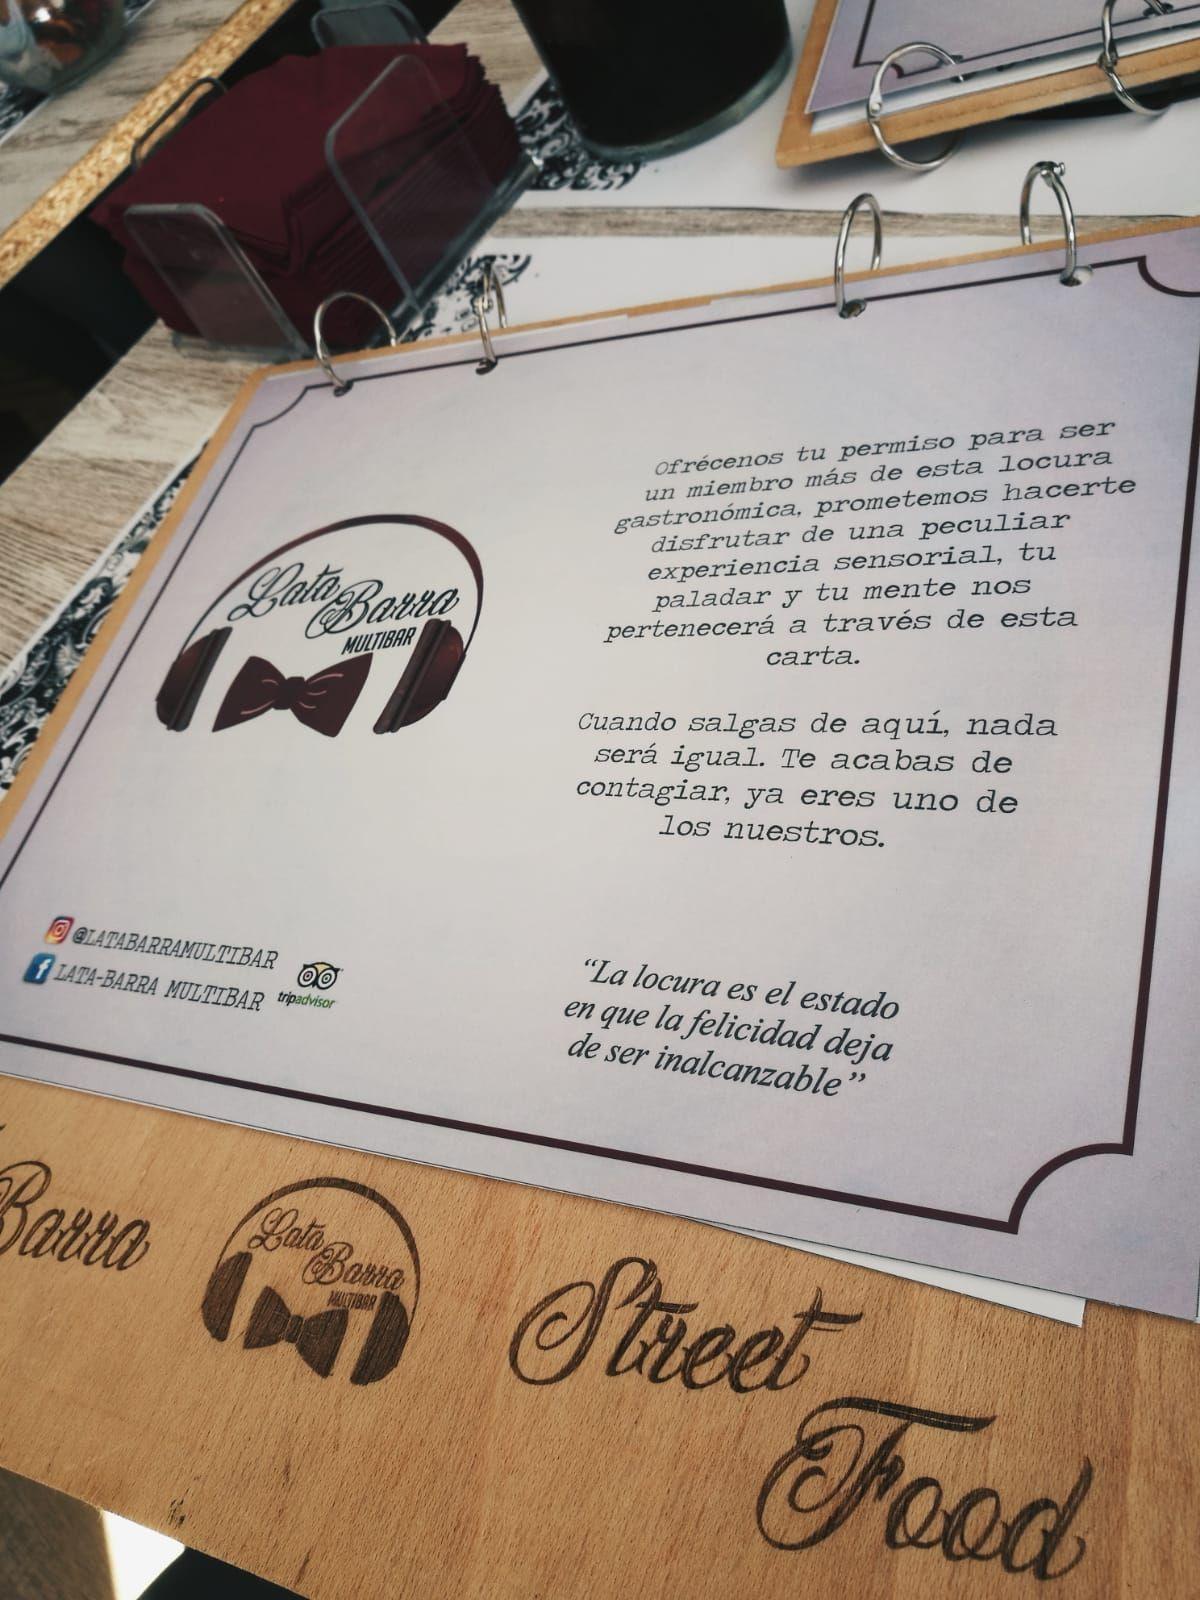 Foto 3 de Cocina internacional en  | Lata Barra Multibar